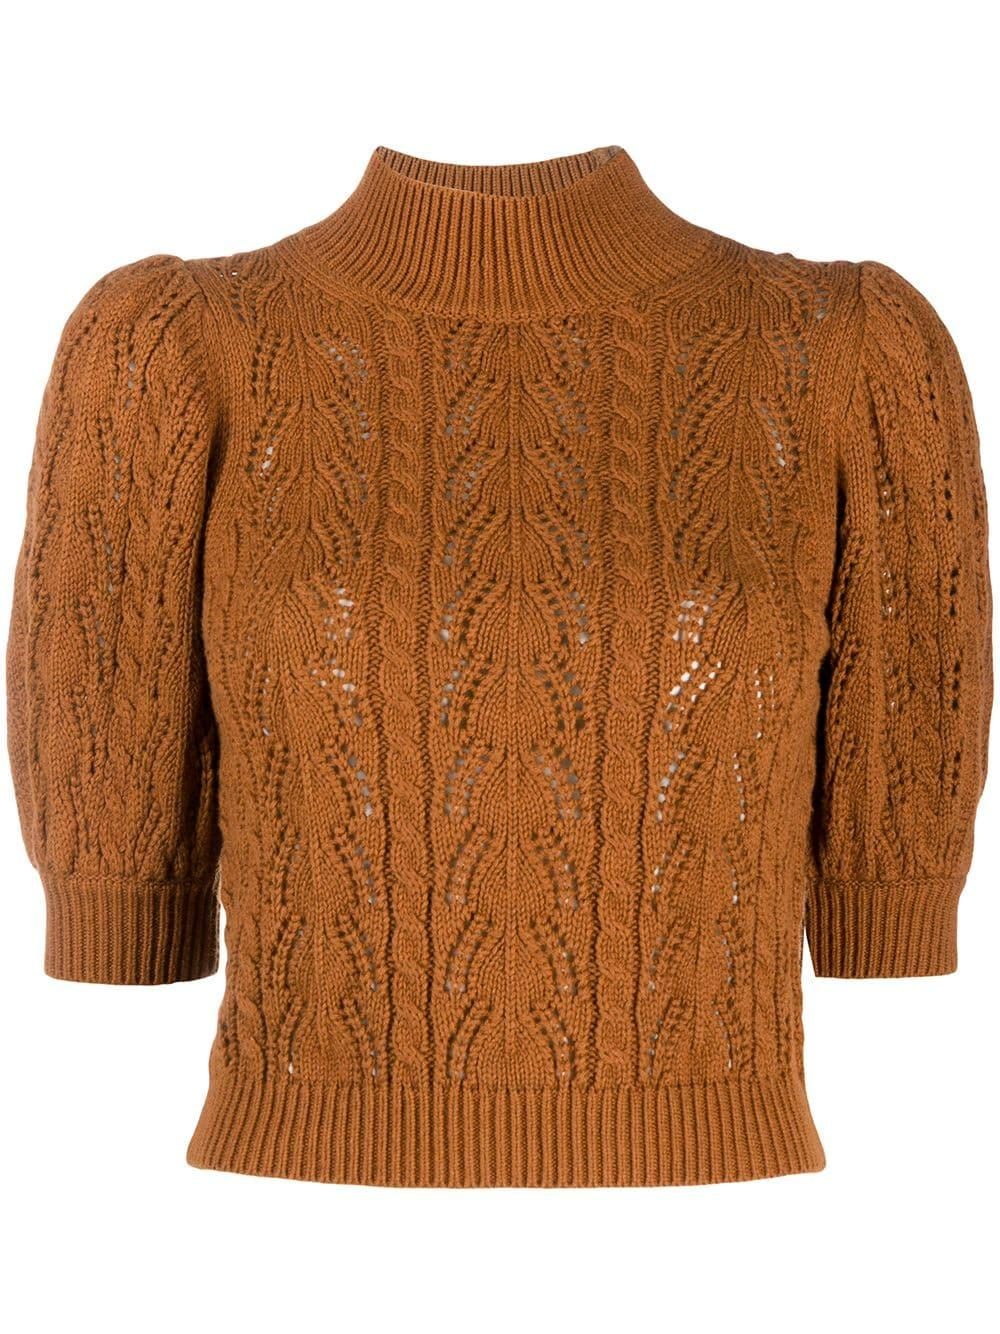 Kyoko Sweater